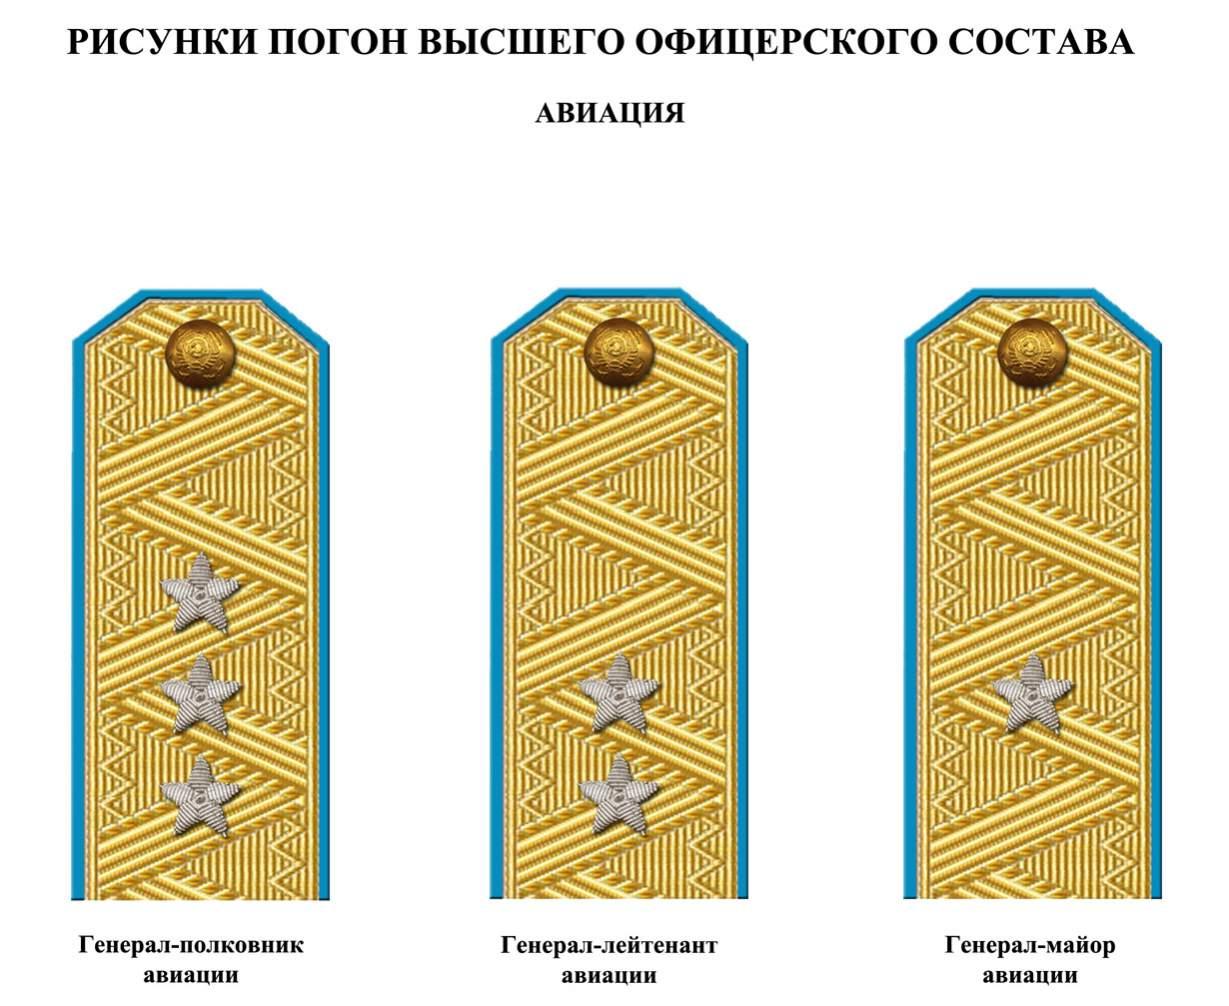 Soviet Officer Ranks Name Soviet Fleet Navy Rank